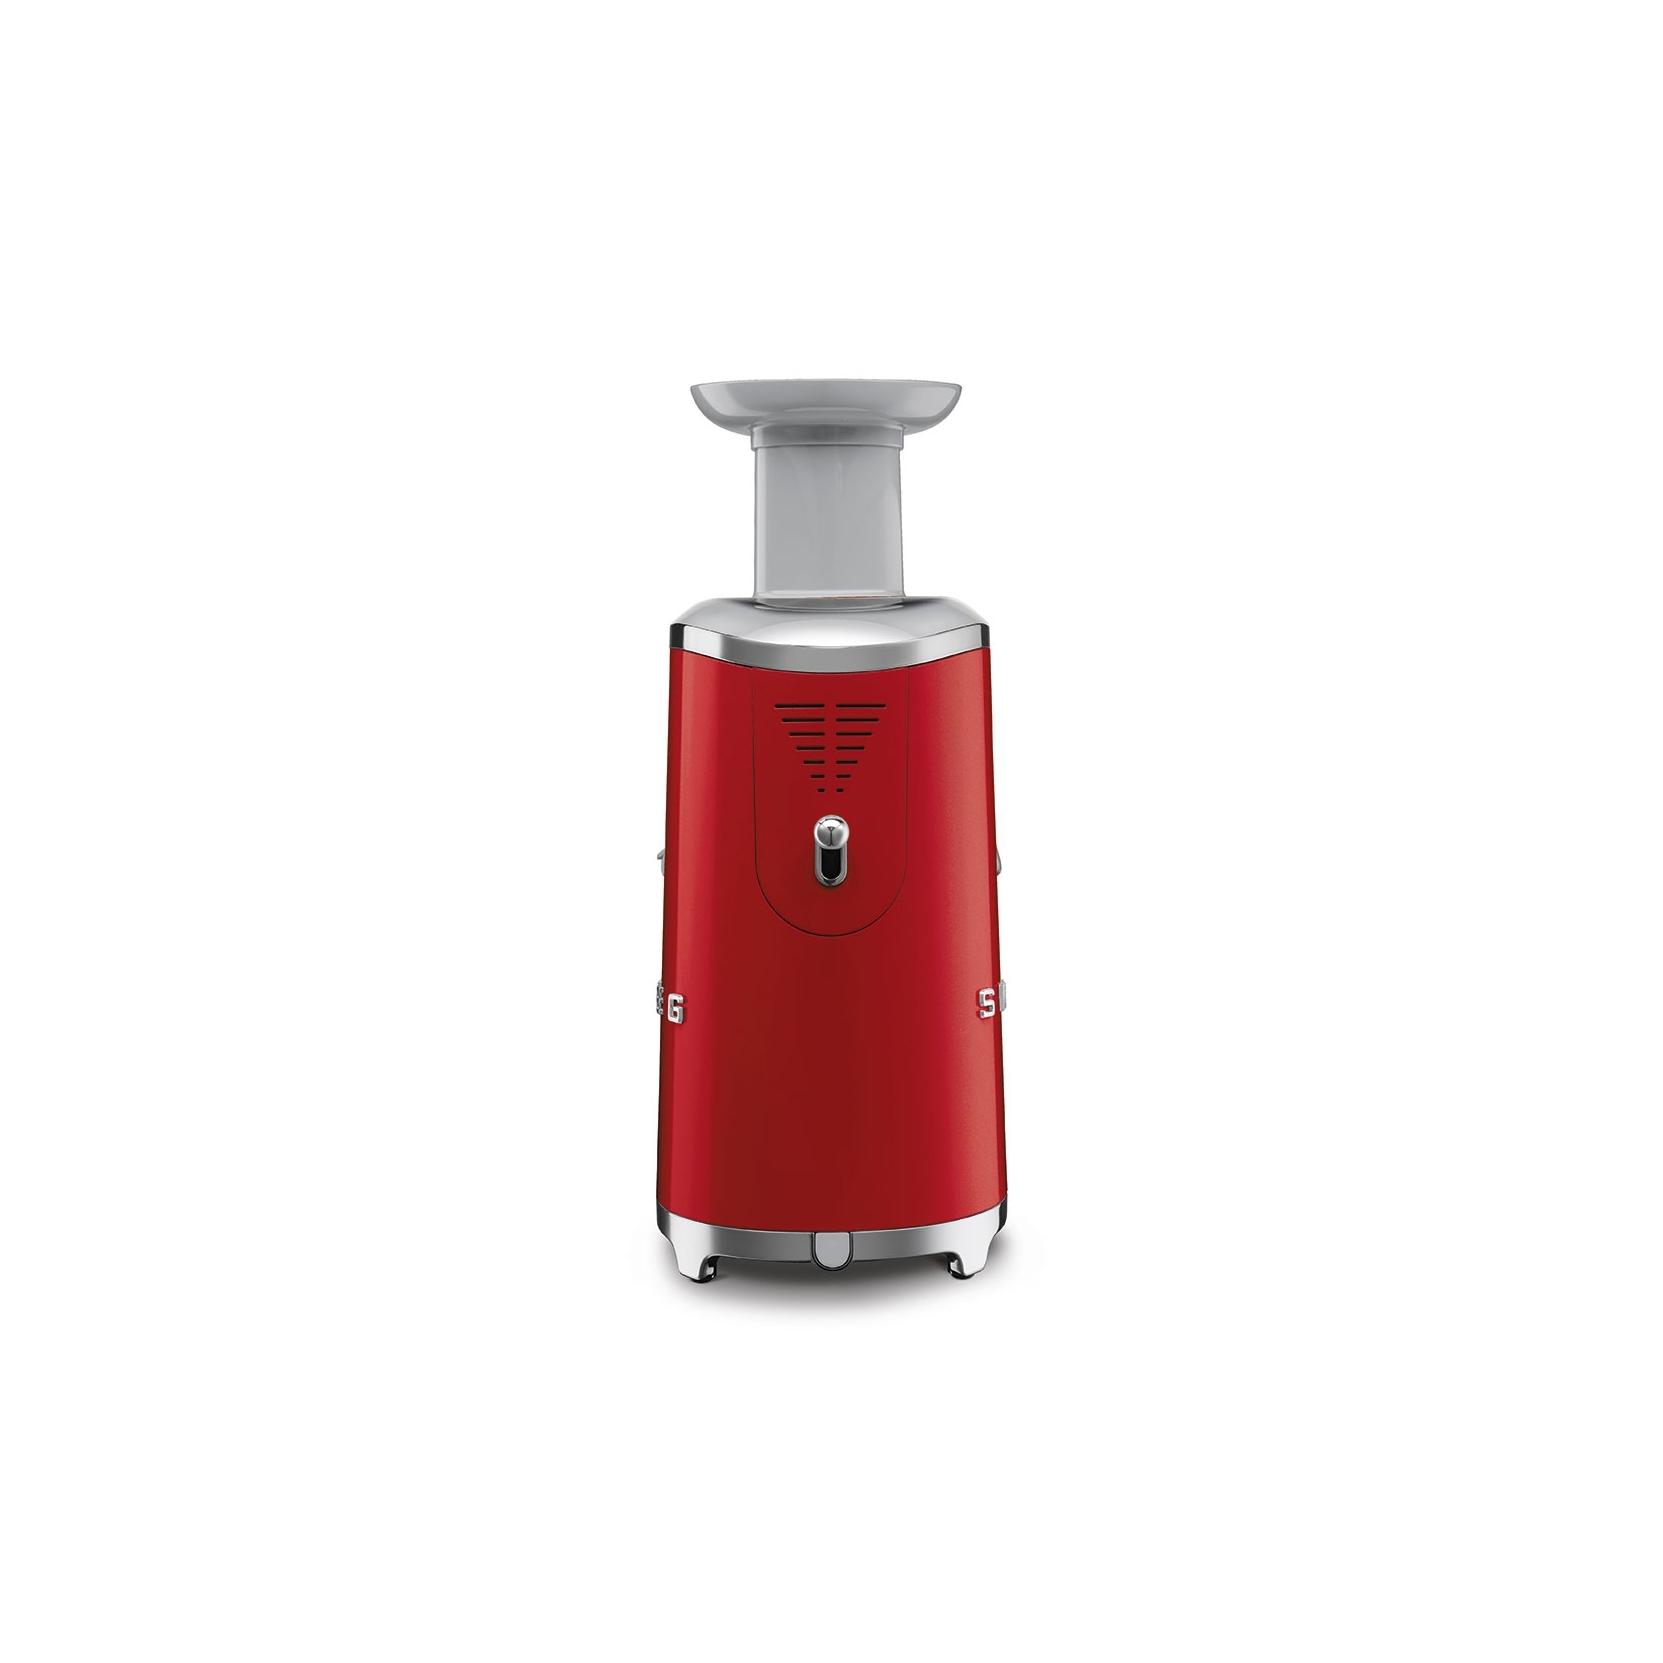 Smeg 50 S Style Slow Juicer Pastel : SMEG SLOW JUICER RETRO STYLE AESTHETIC - TattaHome